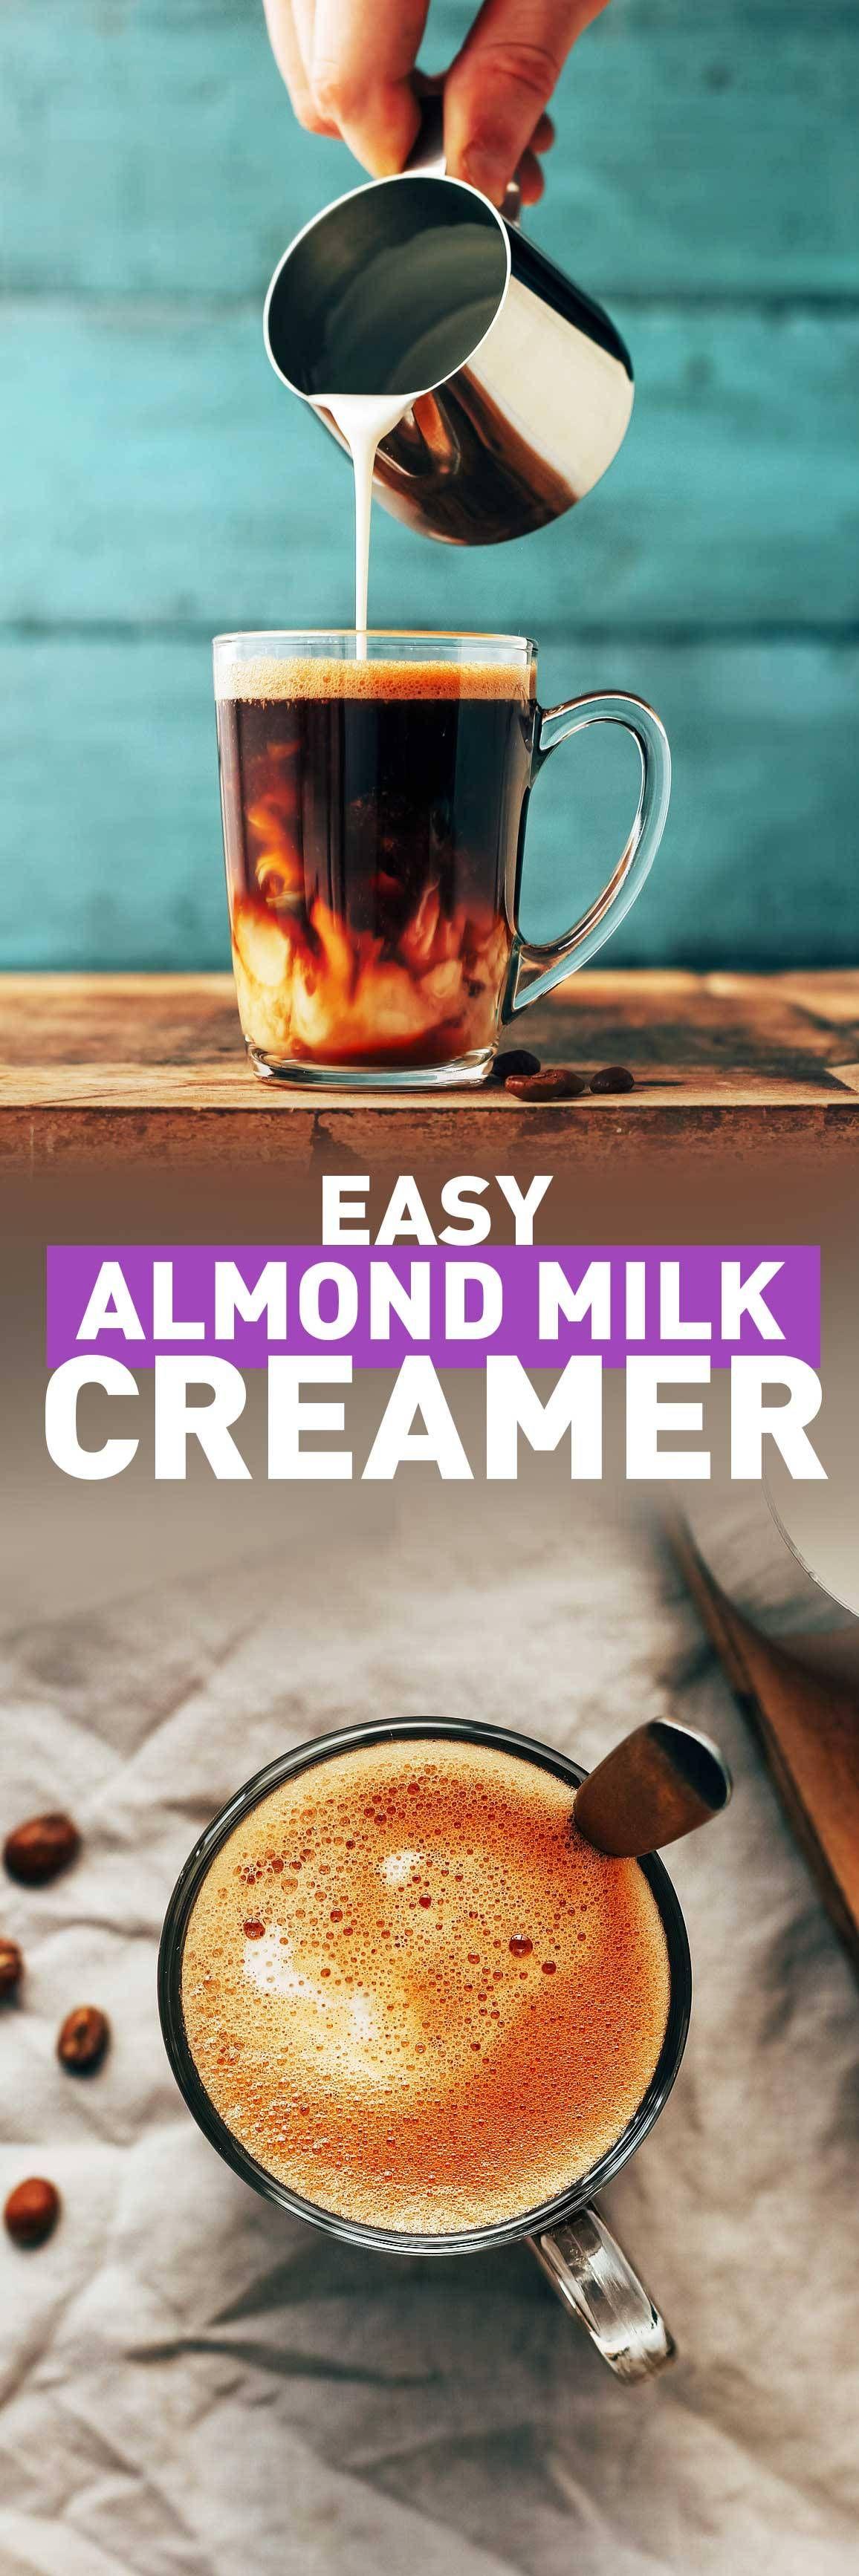 Easy almond milk creamer almond milk creamer almond